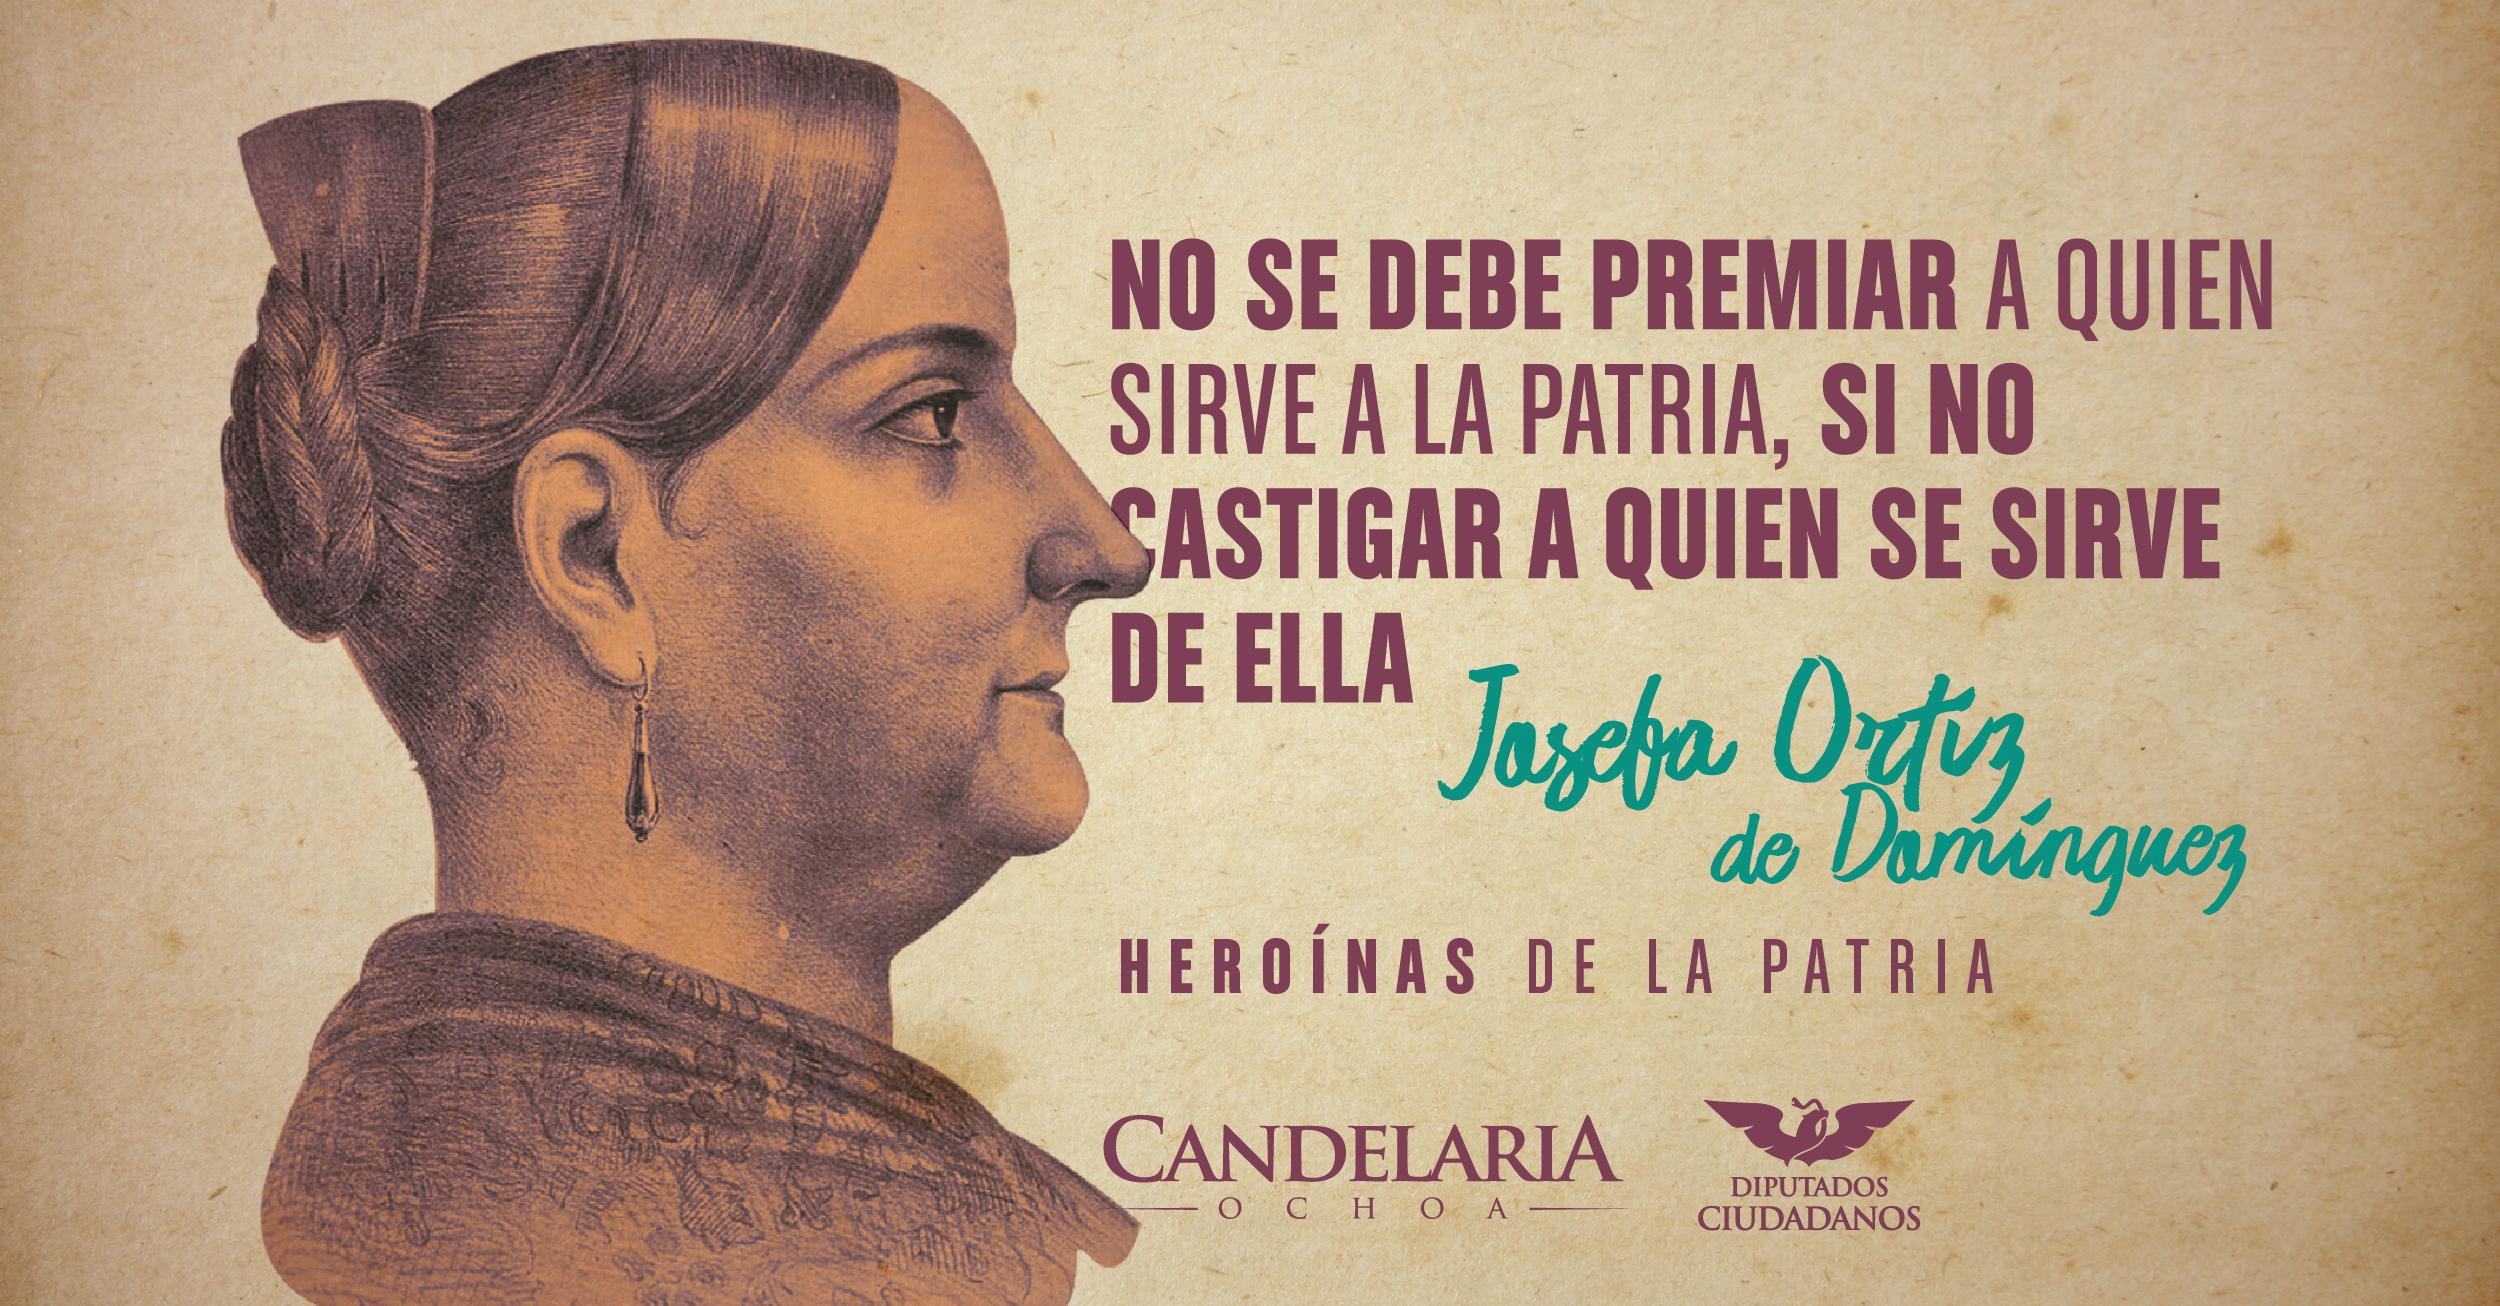 150917_DC_CANDE_HEROÍNAS PATRIAS_JOSEFA ORTIZ -01